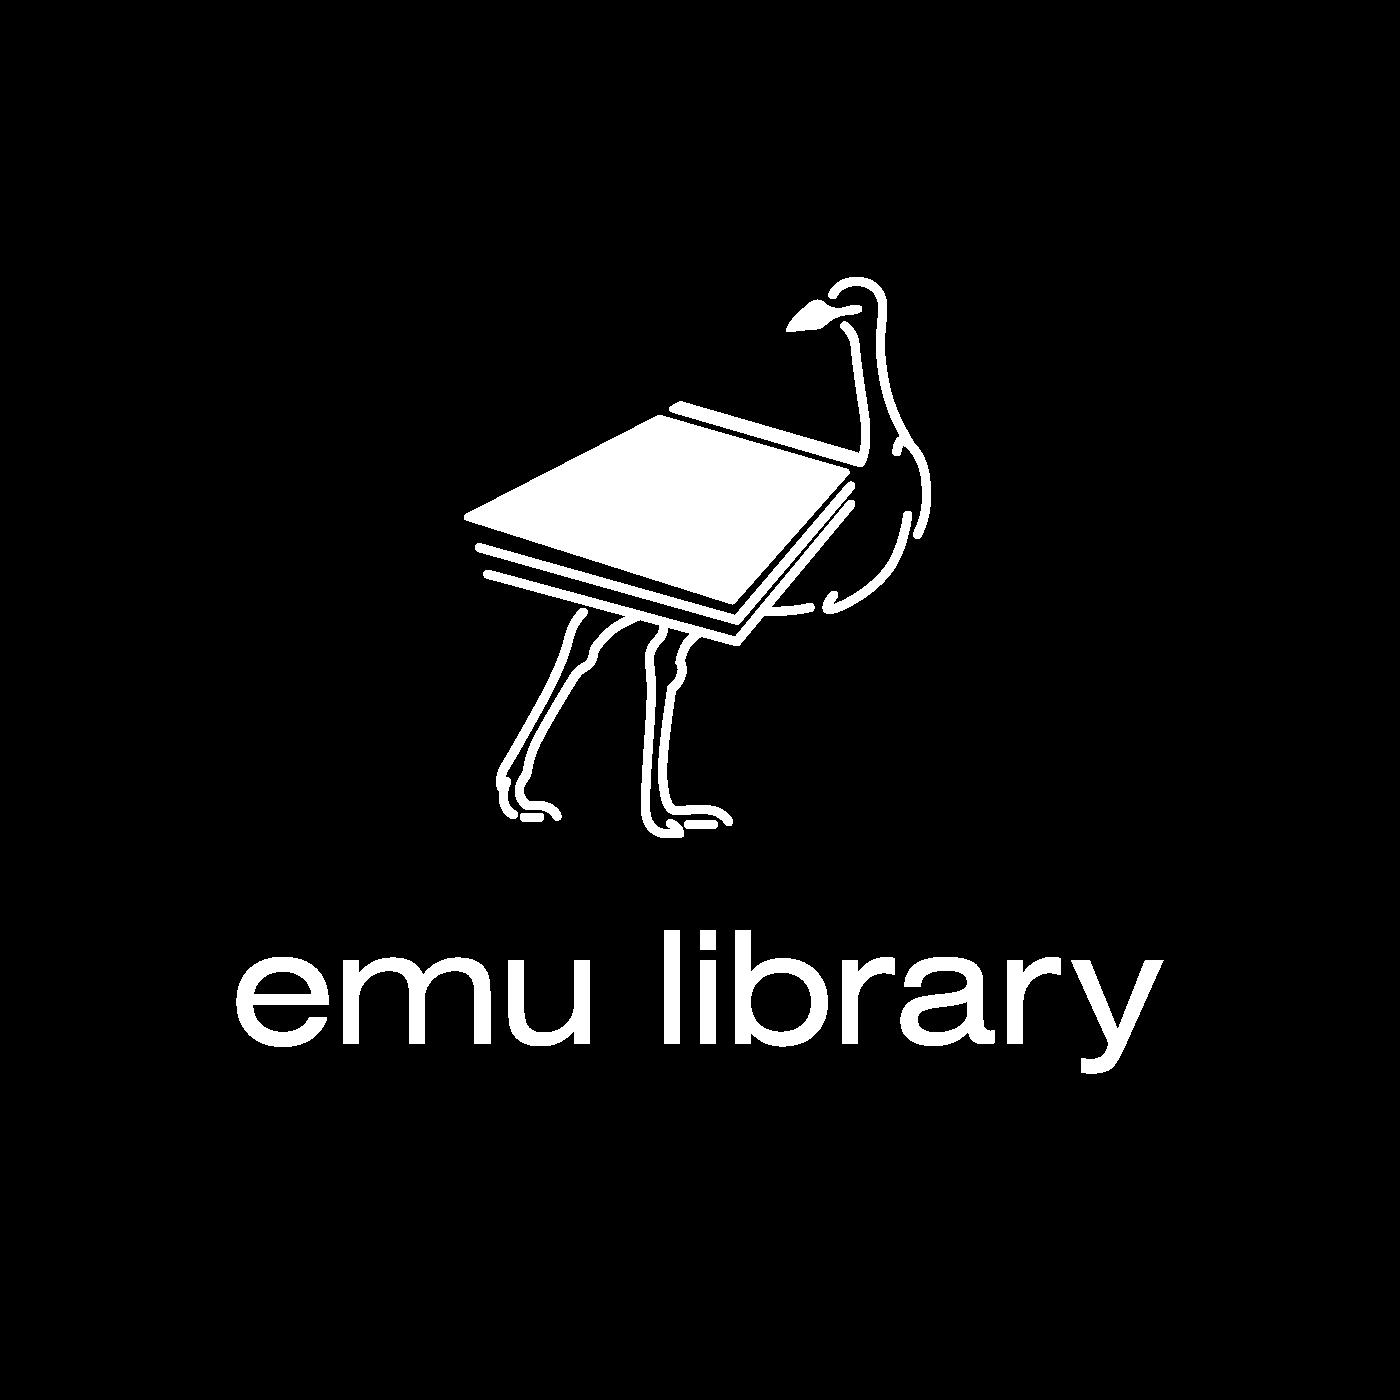 emu library